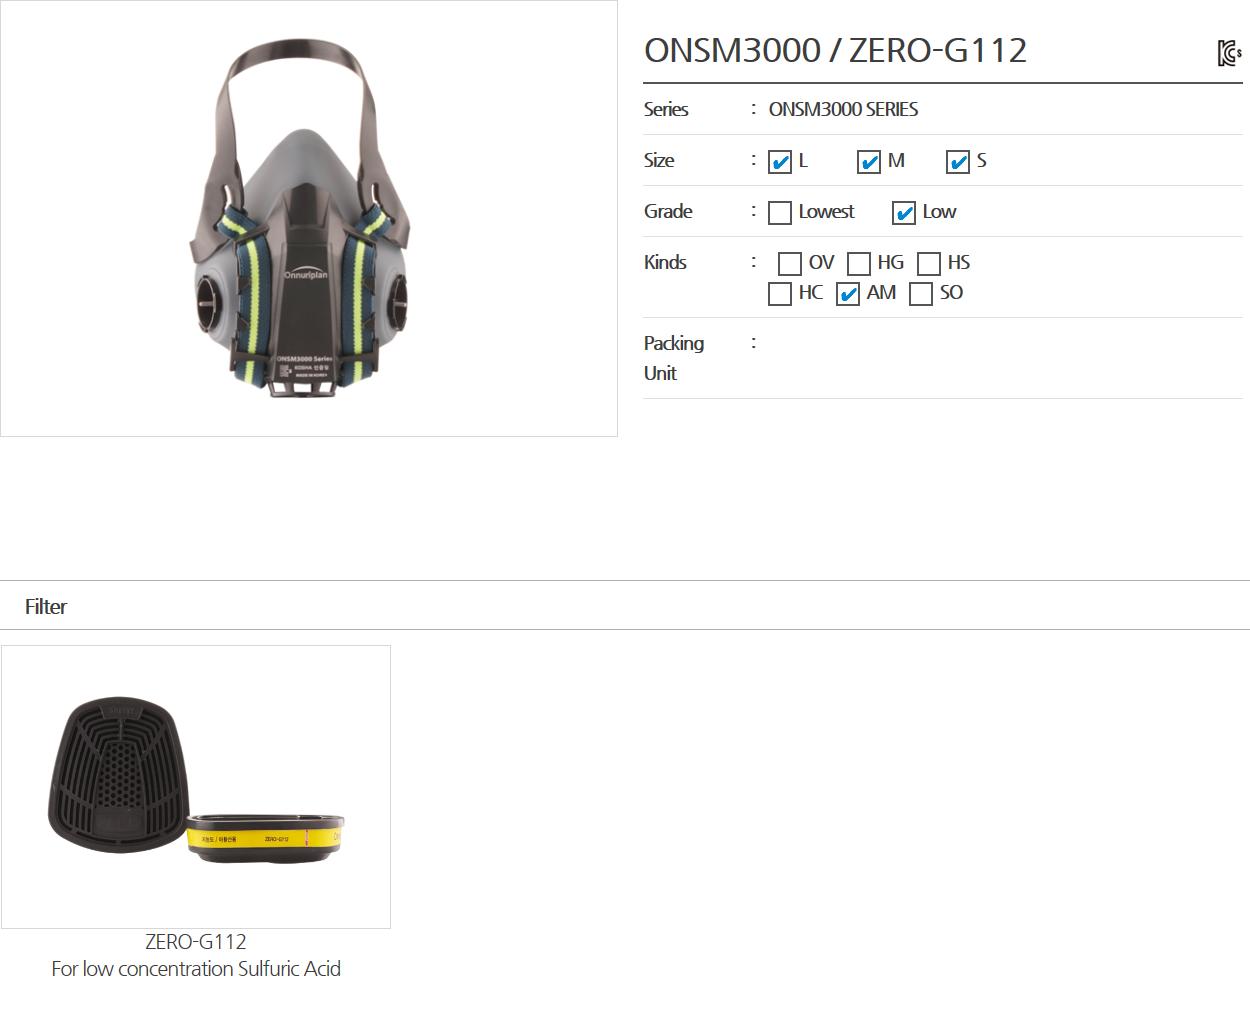 Onnuri Plan  ONSM3000 / ZERO-G112